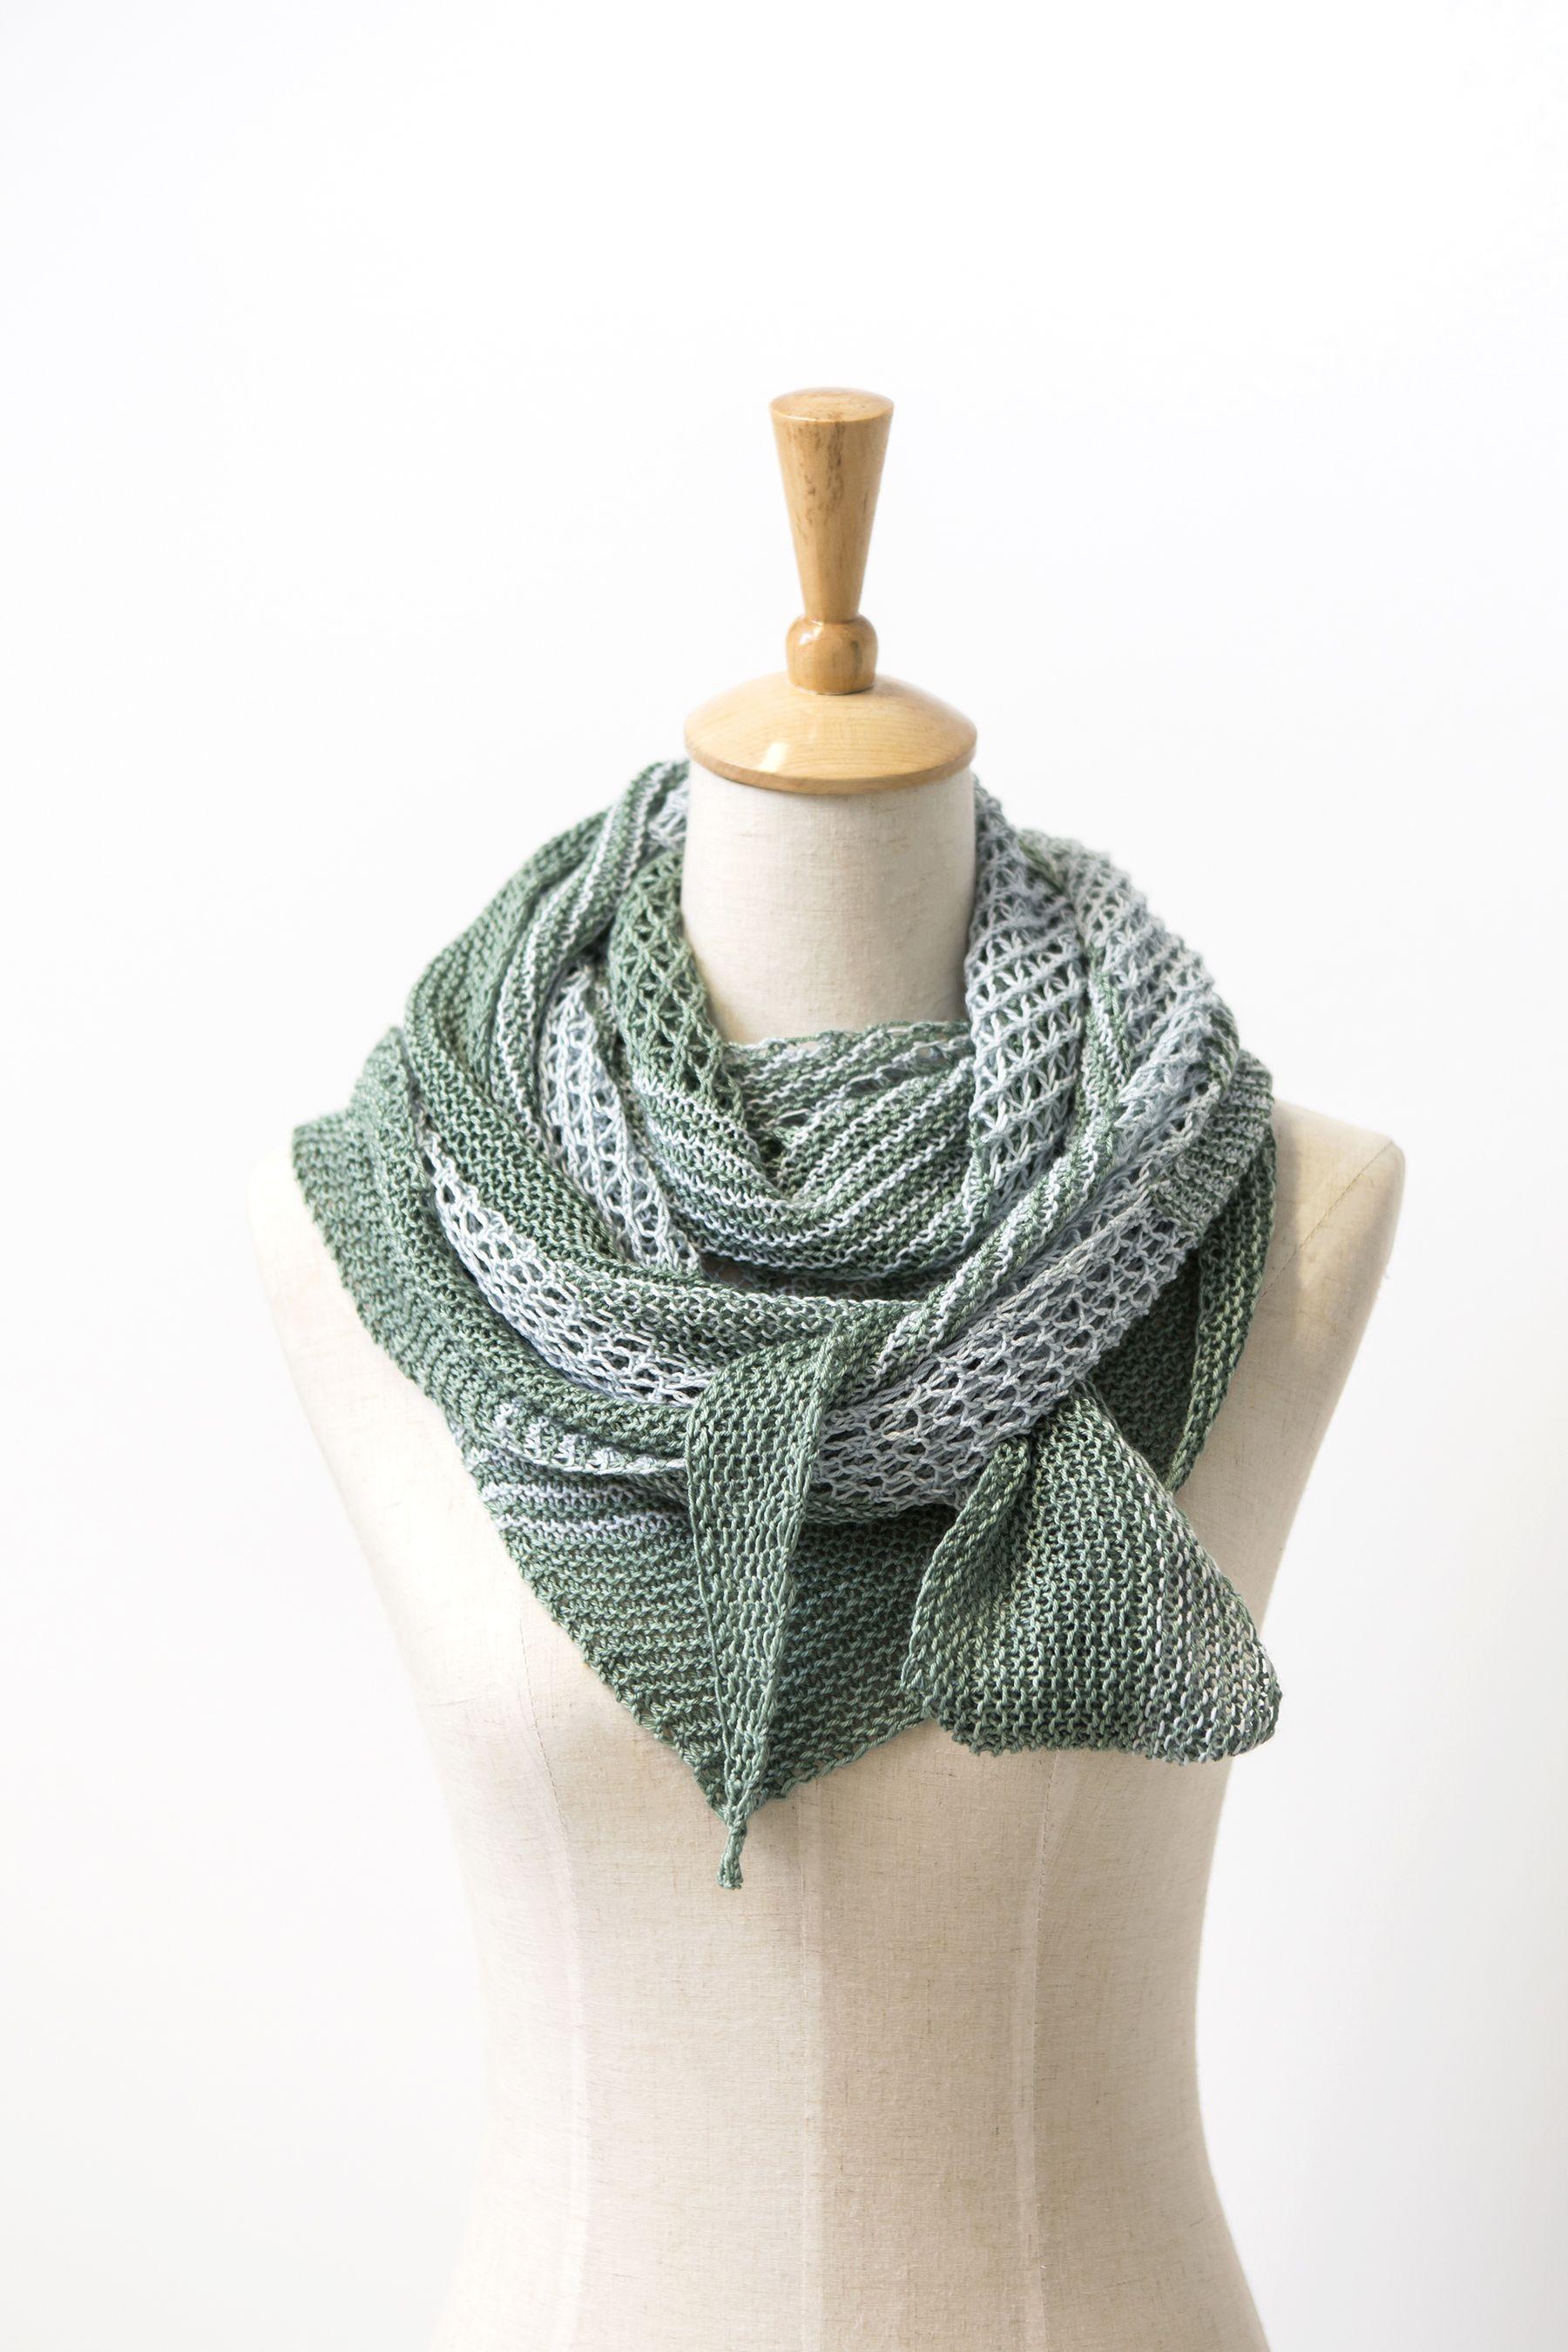 Ravelry sea grass shawl with dyeforyarn merinosilk fingering ravelry sea grass shawl with dyeforyarn merinosilk fingering knitting pattern by janina bankloansurffo Images